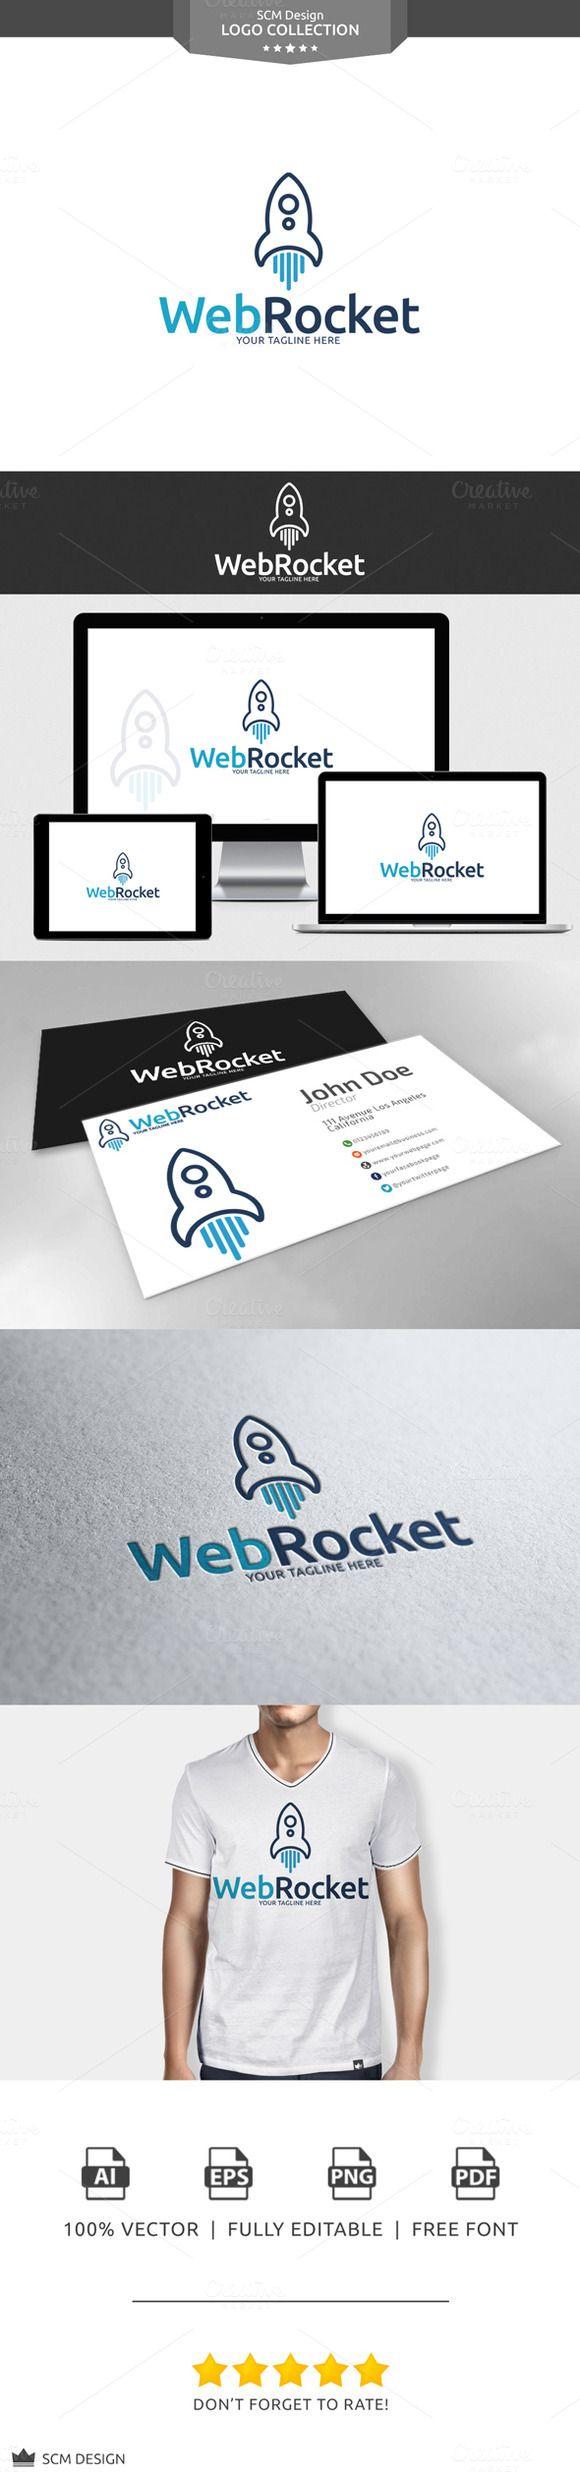 Web Rocket Logo by Seceme Shop on @creativemarket